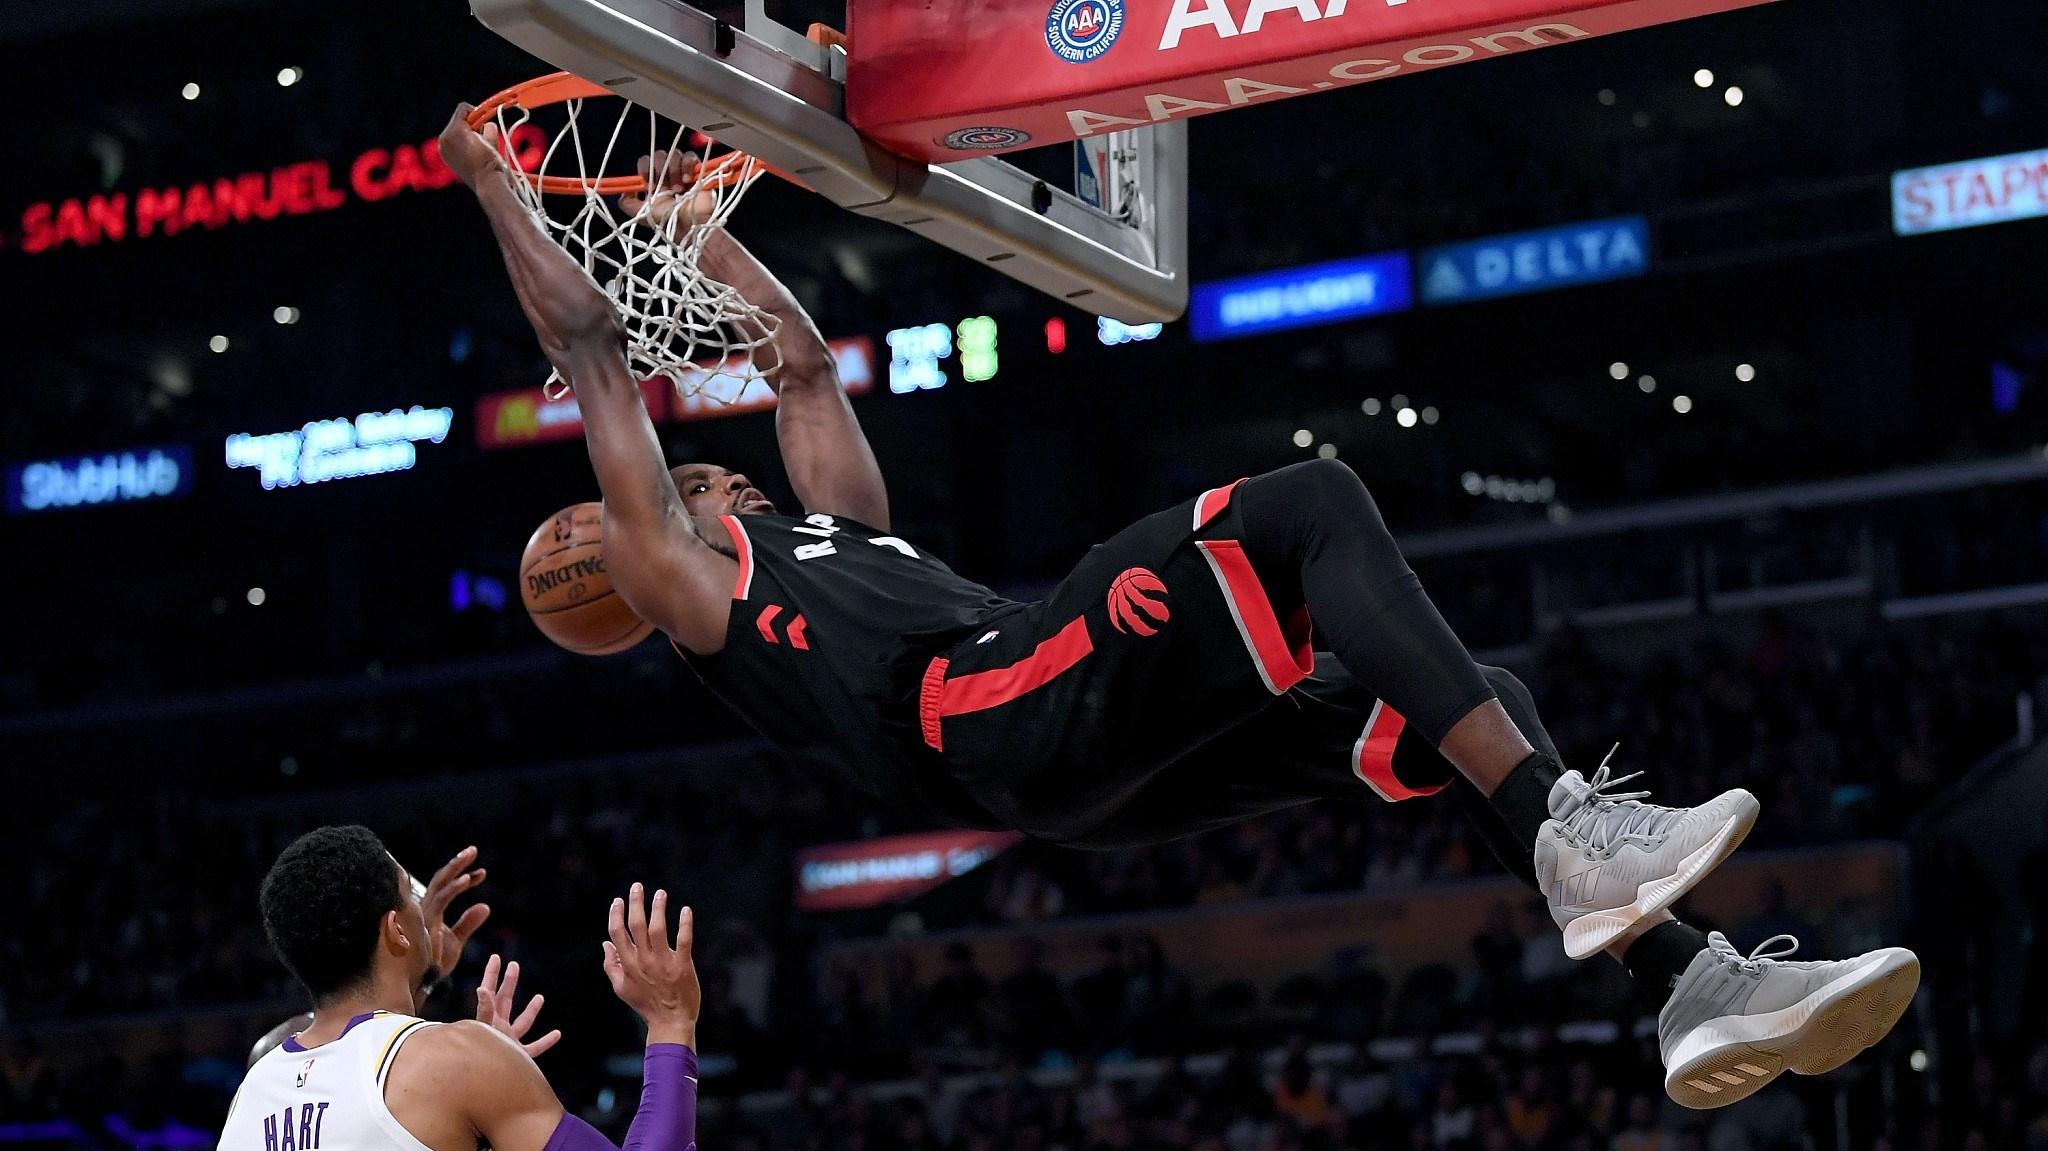 22ebfcfd6 NBA highlights on Nov. 4  Raptors humiliate Lakers without Kawhi ...